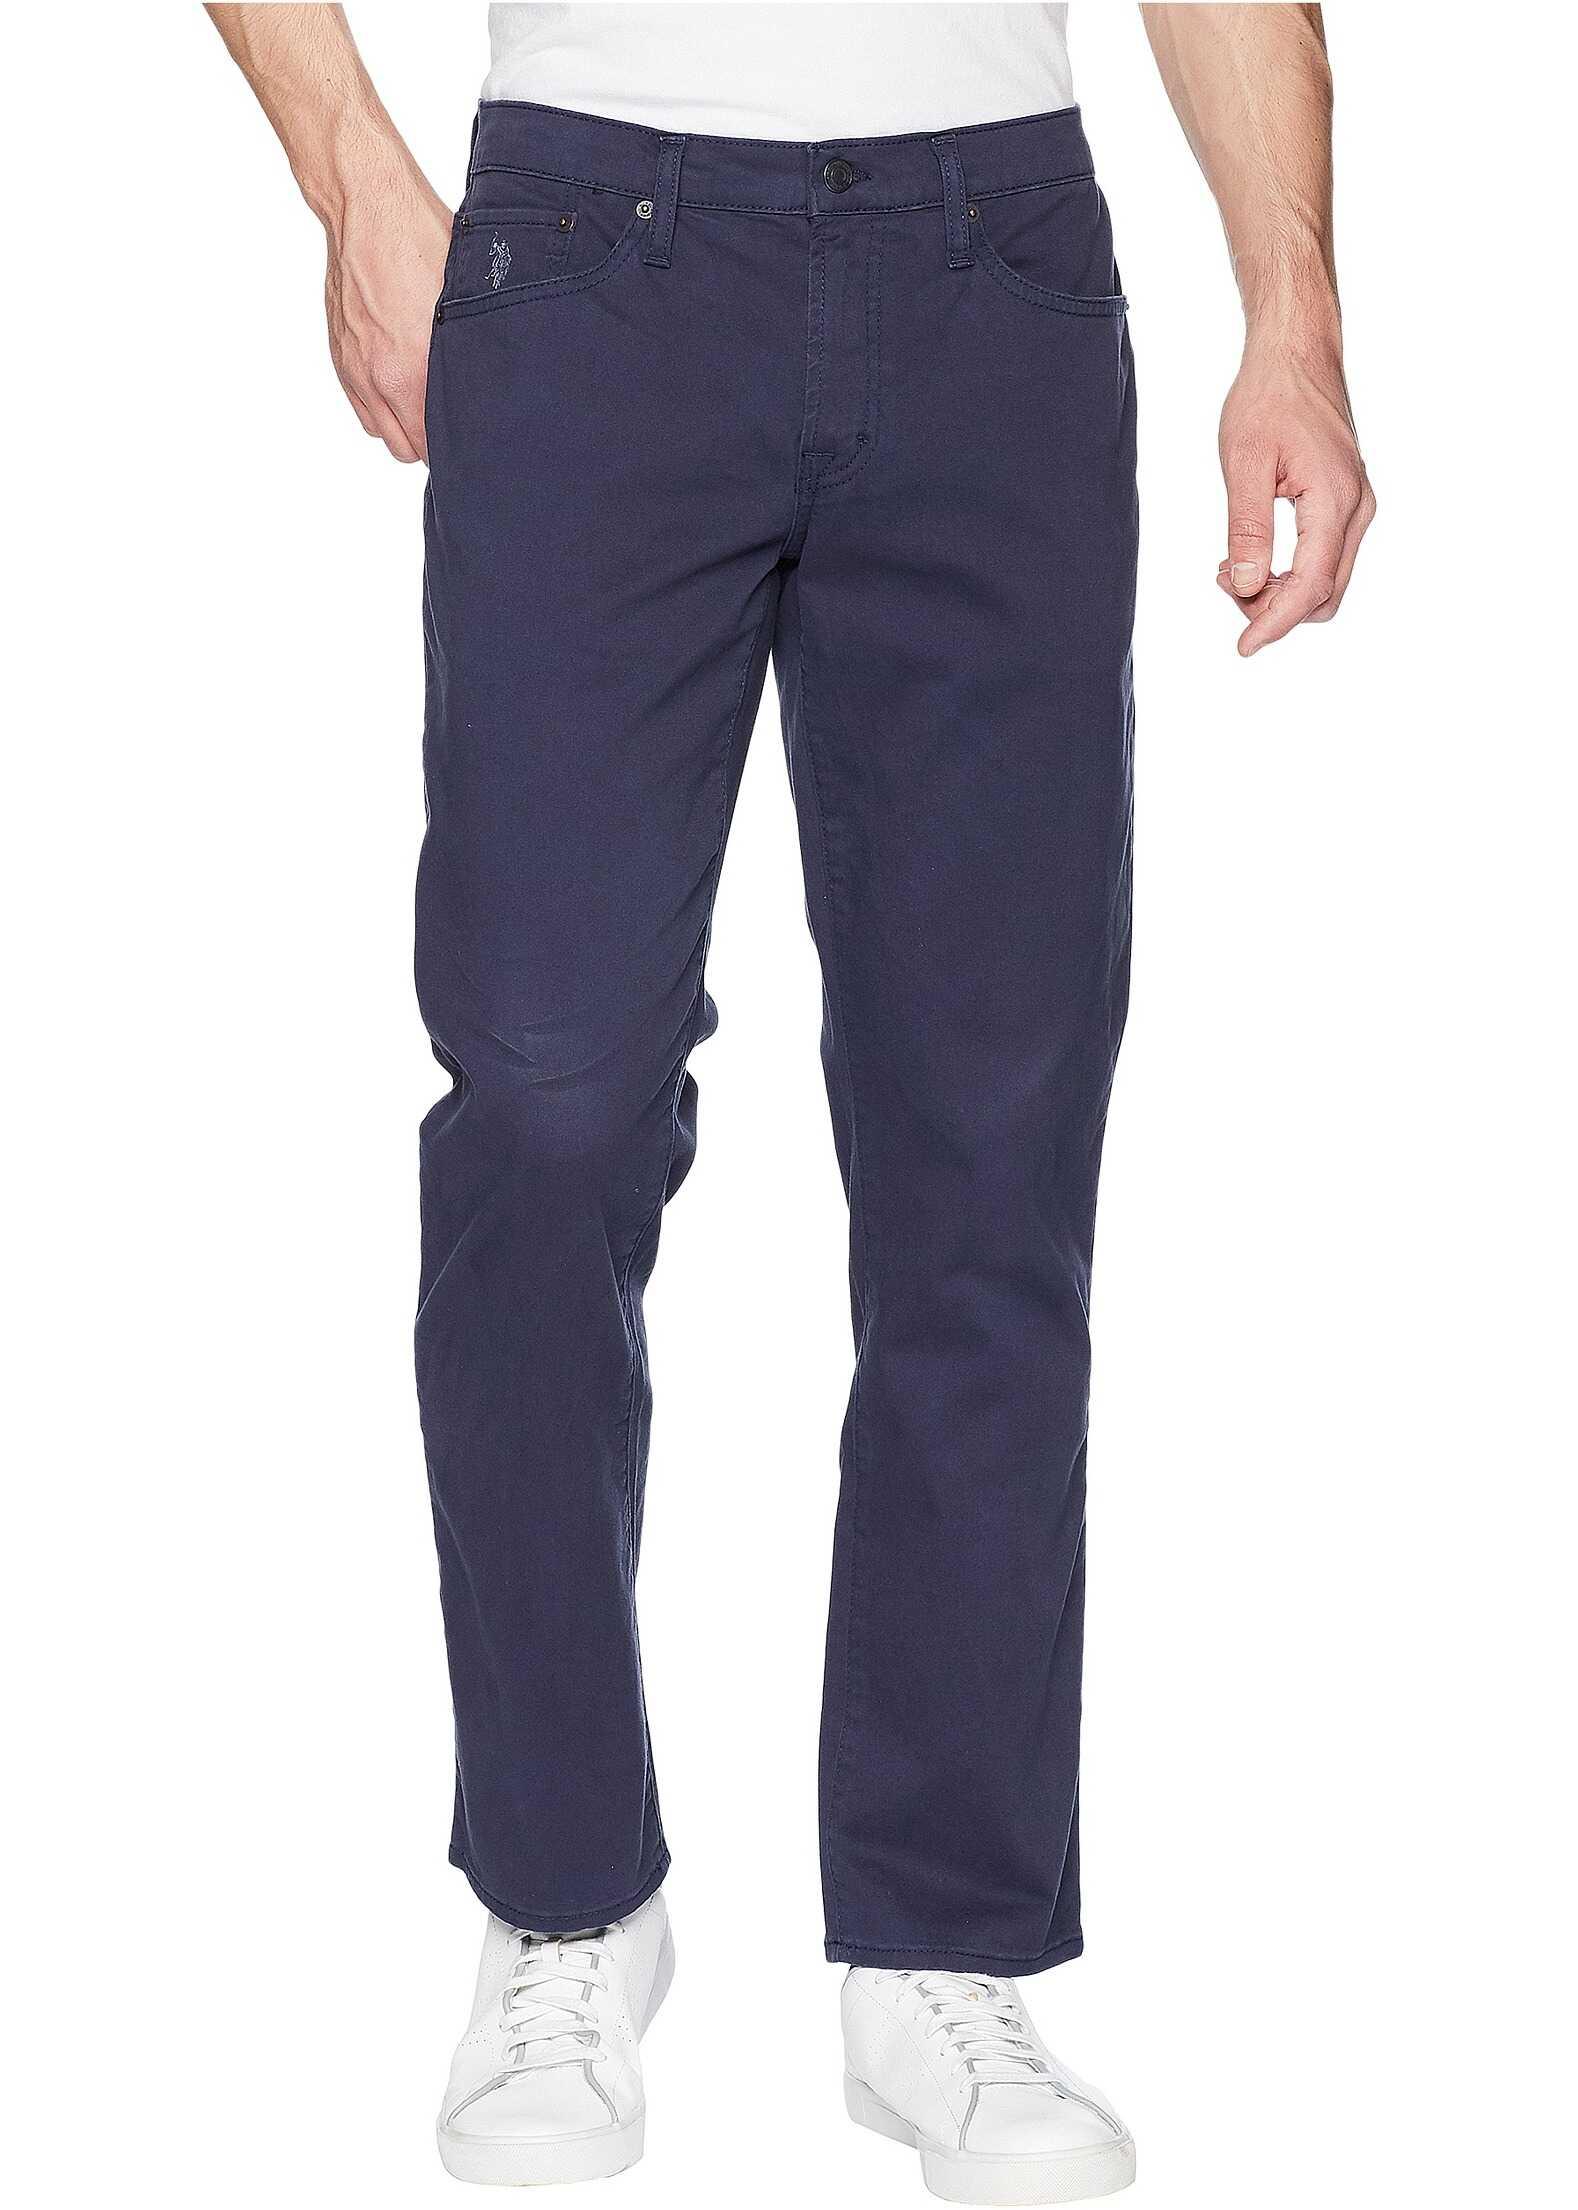 U.S. POLO ASSN. Slim Straight Stretch Five-Pocket Pants Club Navy